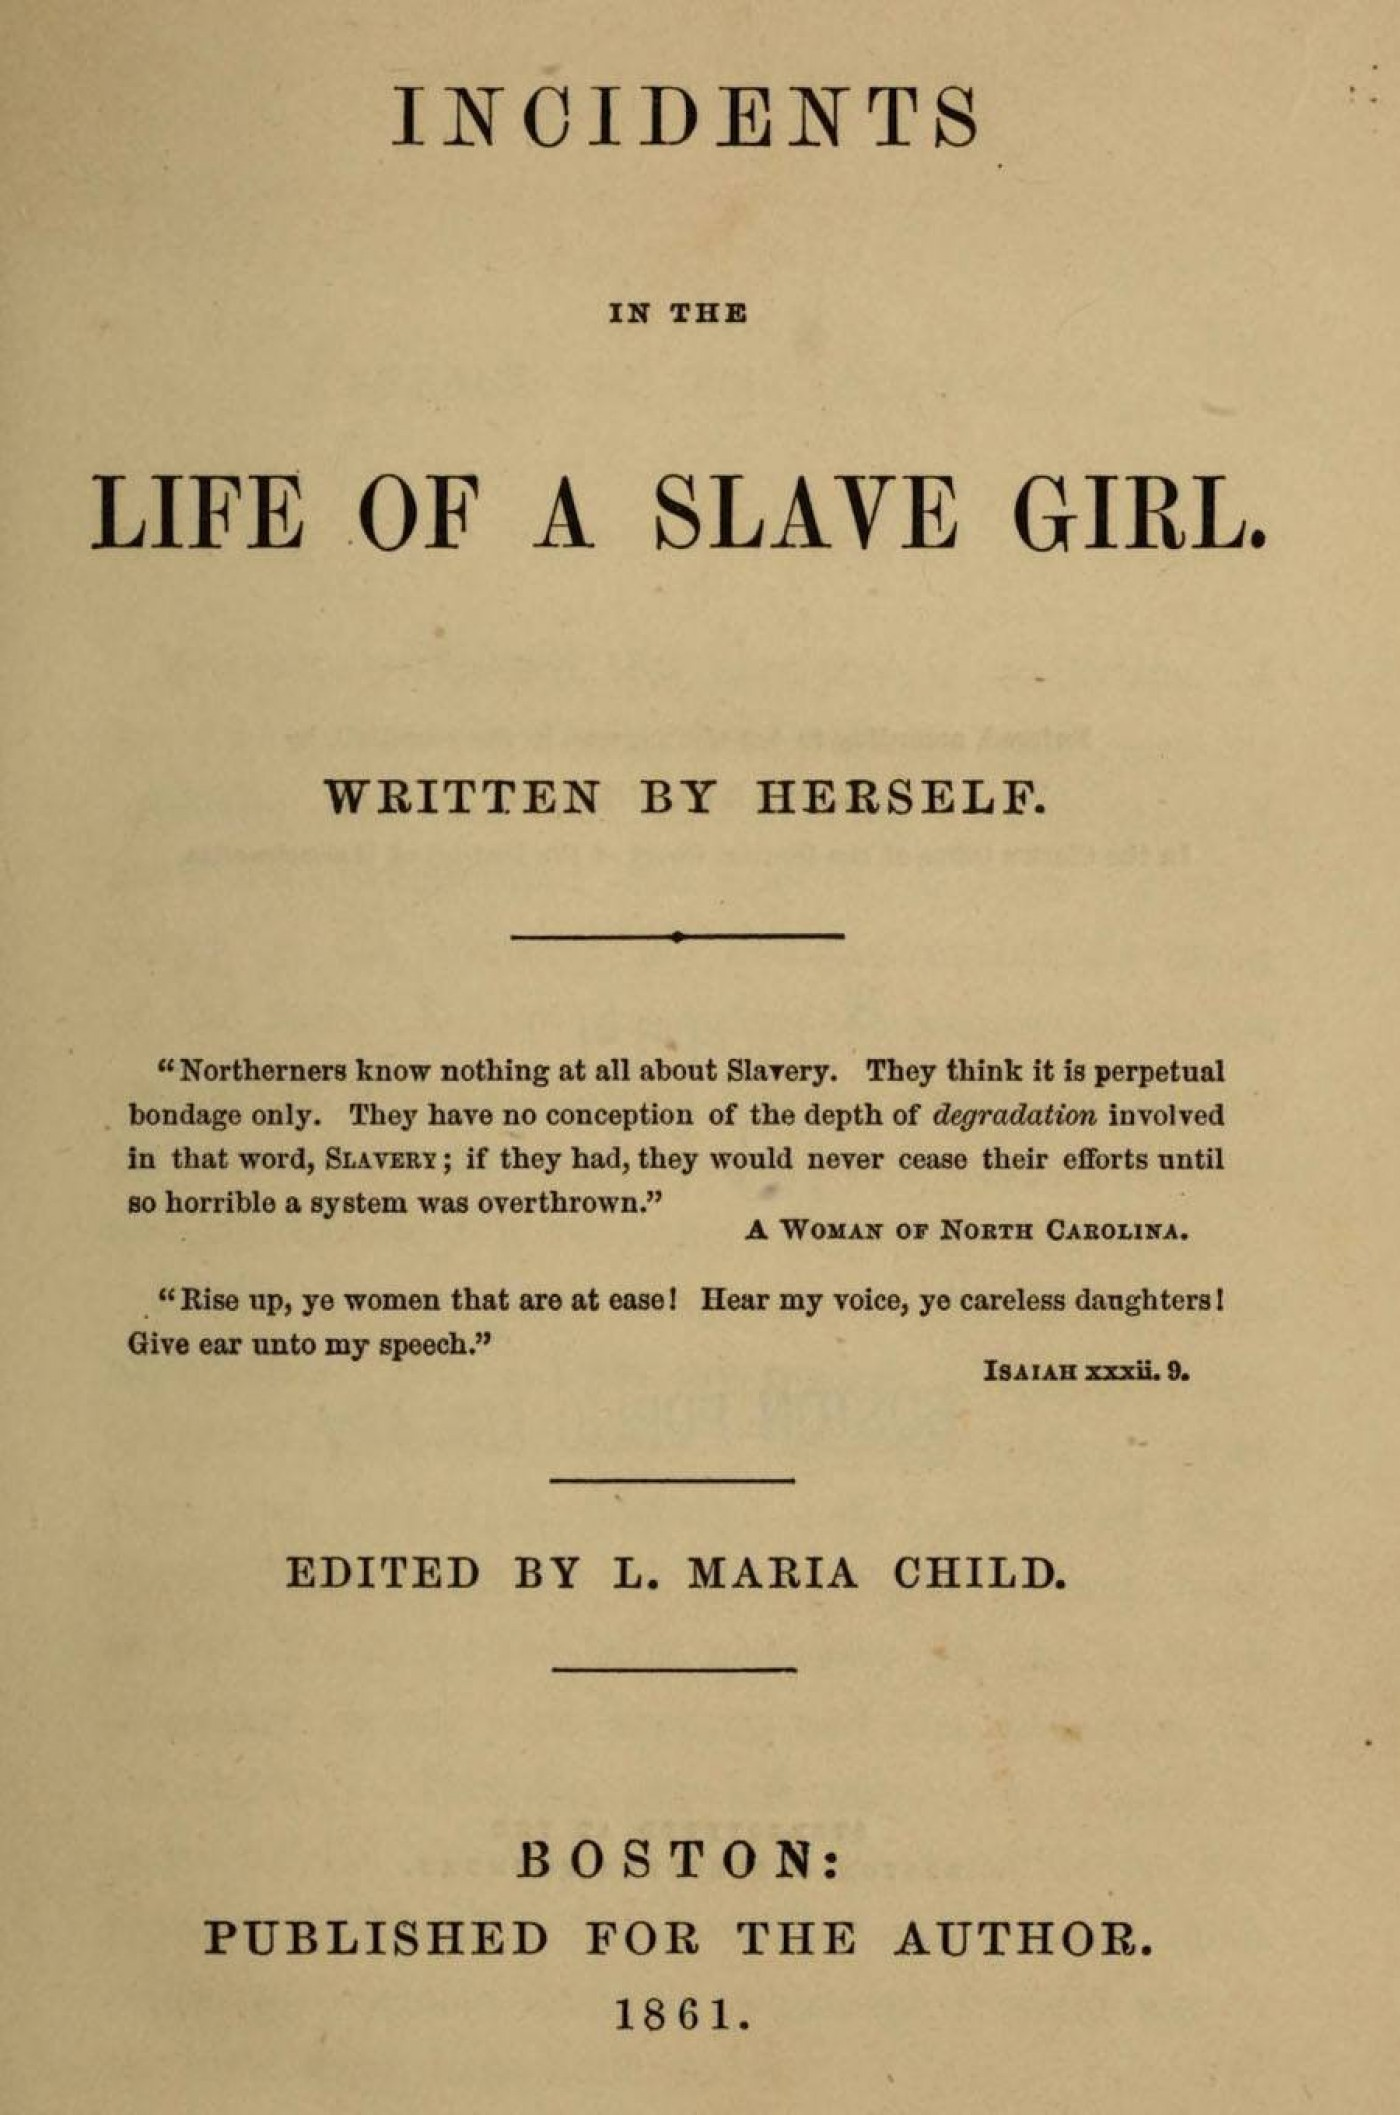 001 Harriet Jacobs Essay Example Black History Remarkable Vs Frederick Douglass Topics Analysis 1400